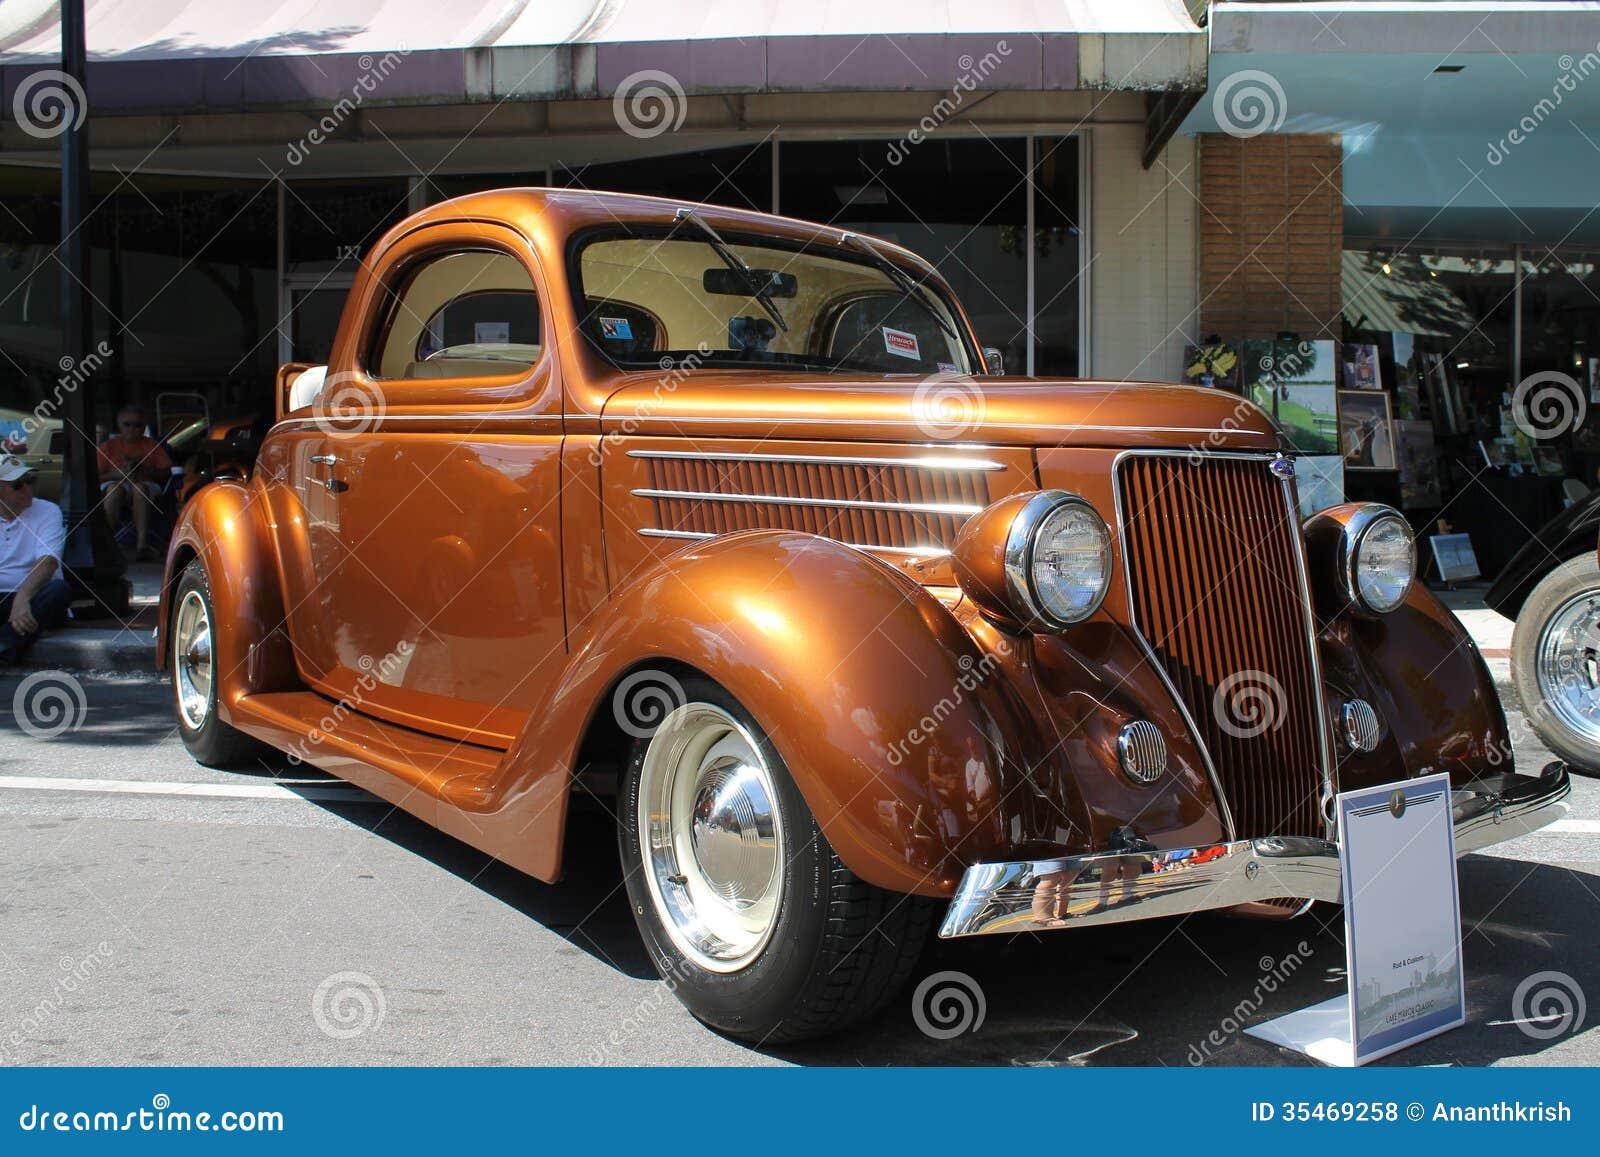 Funky Nada Old Car Ornament - Classic Cars Ideas - boiq.info